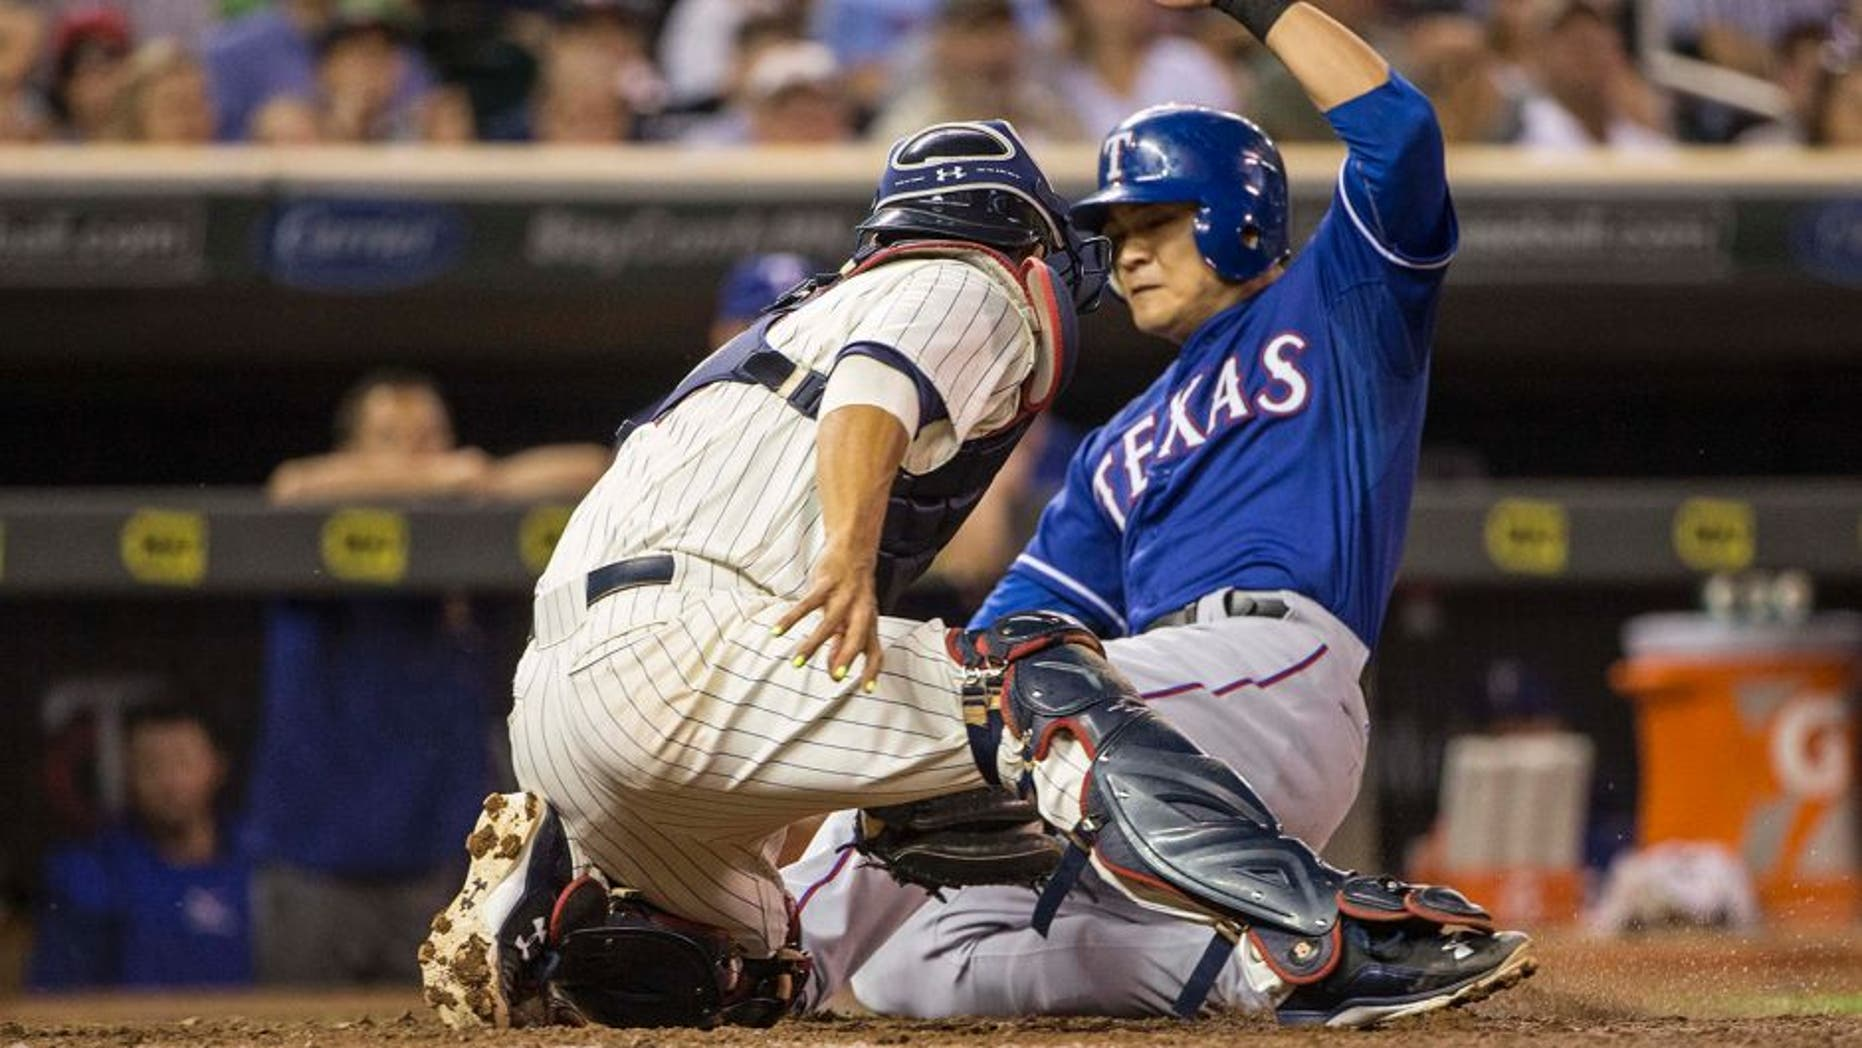 Aug 12, 2015; Minneapolis, MN, USA; Minnesota Twins catcher Kurt Suzuki (8) tags out Texas Rangers right fielder Shin-Soo Choo (17) at home plate in the sixth inning at Target Field. Mandatory Credit: Jesse Johnson-USA TODAY Sports